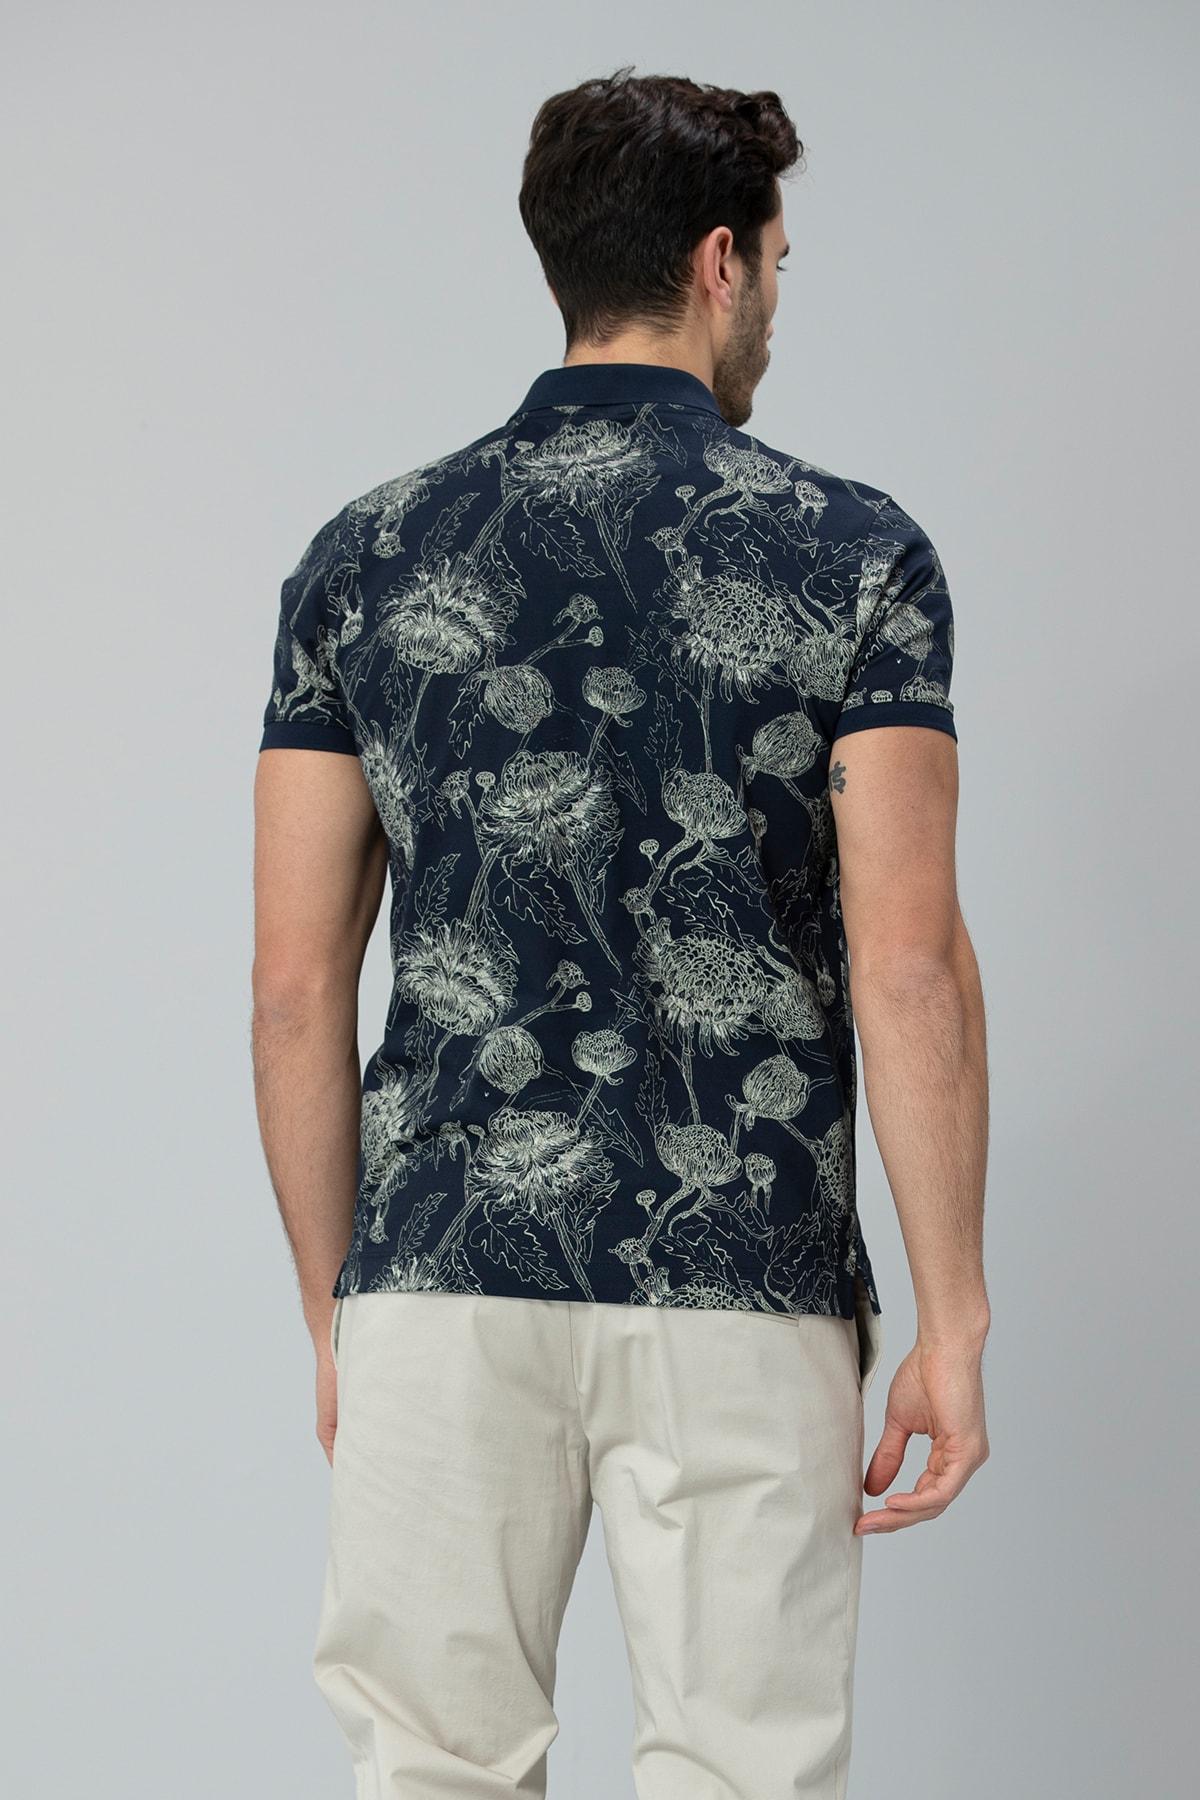 Lufian Capri Spor Polo T- Shirt Lacivert 2